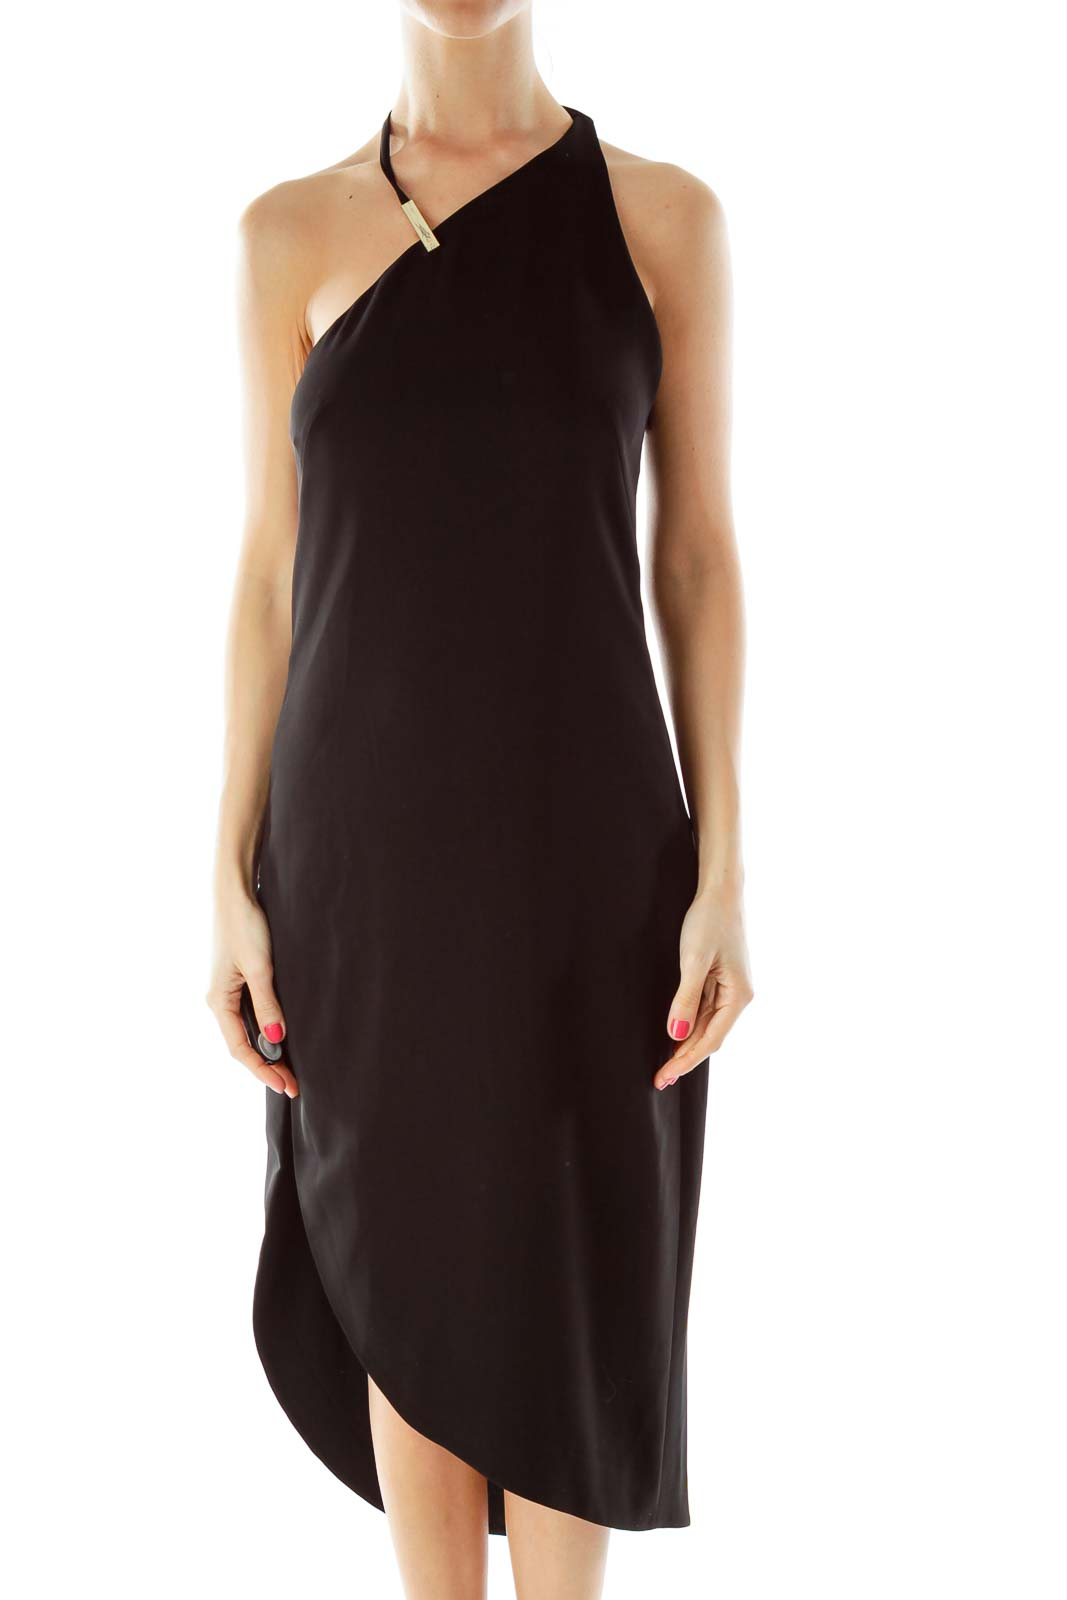 Black One Shoulder Asymmetric Dress 0442da98c5d28